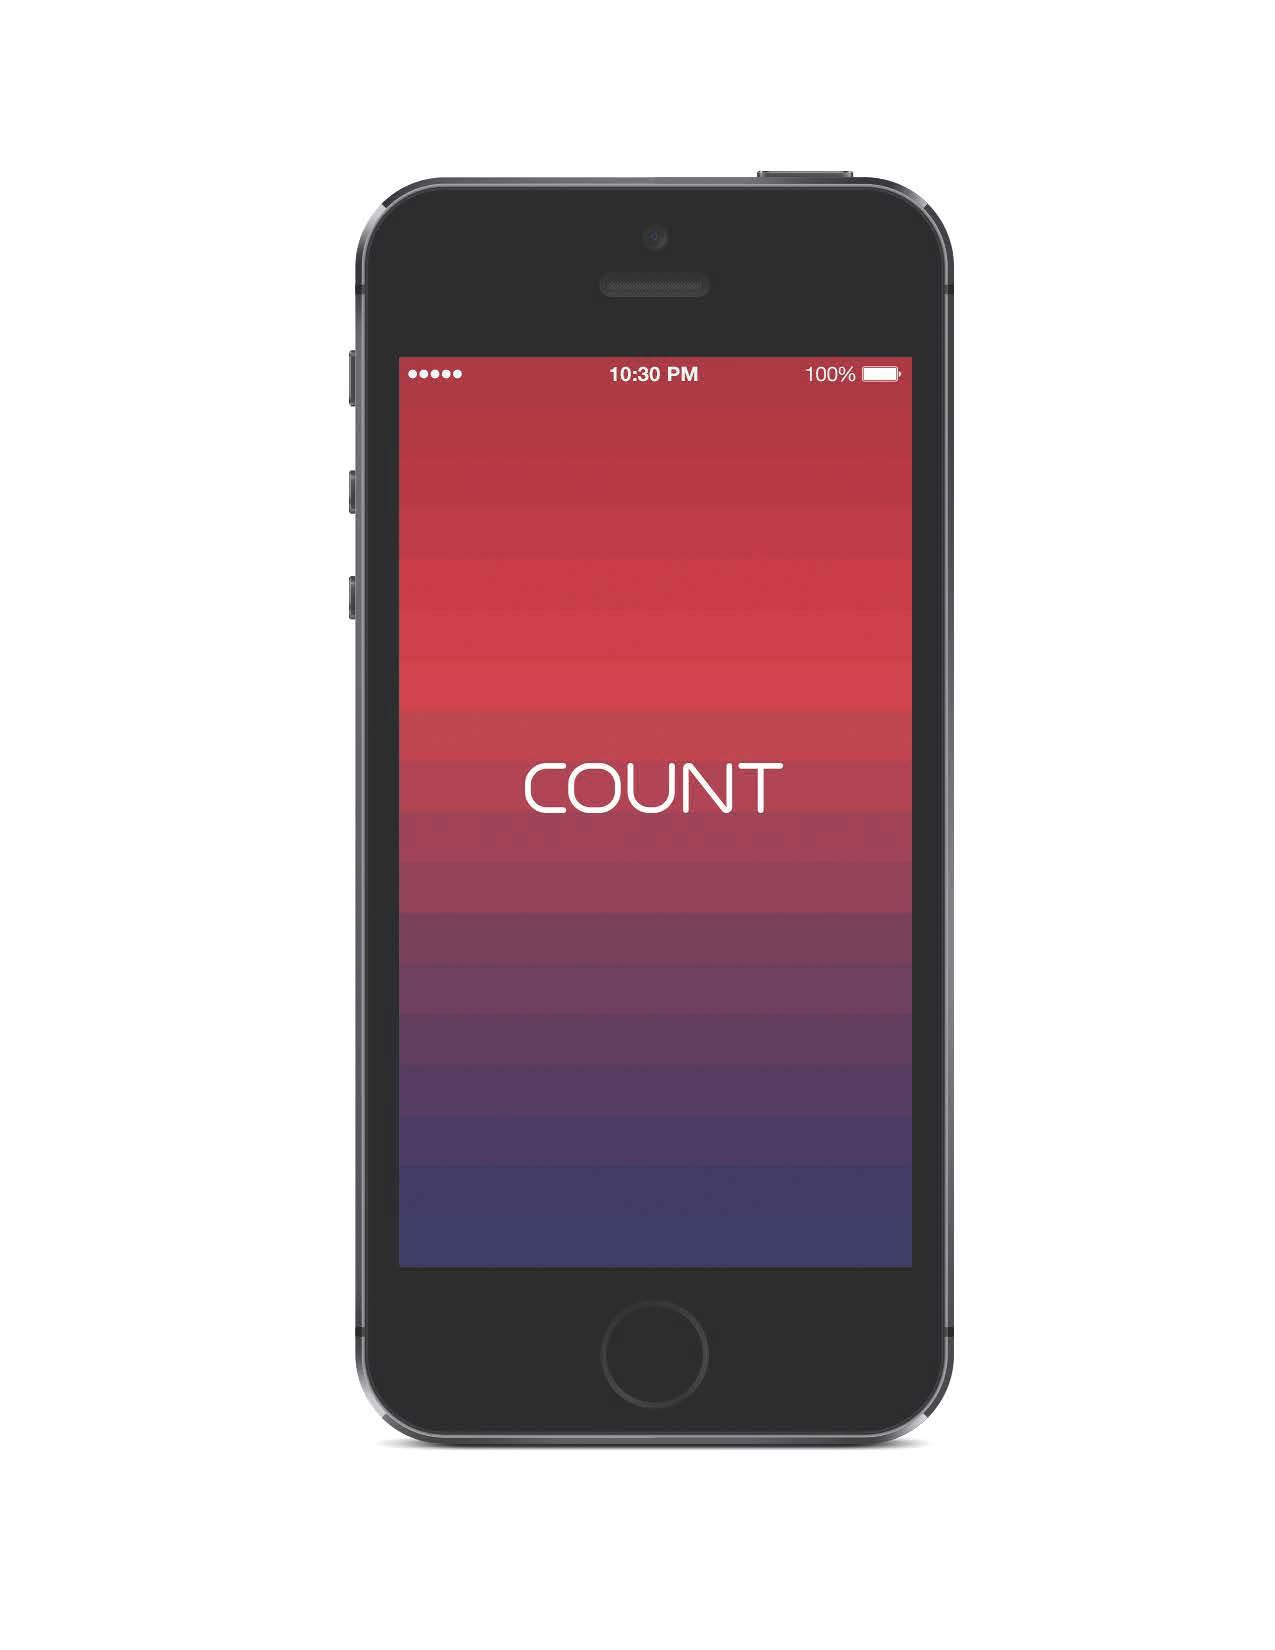 CountApp_Page_2.jpg